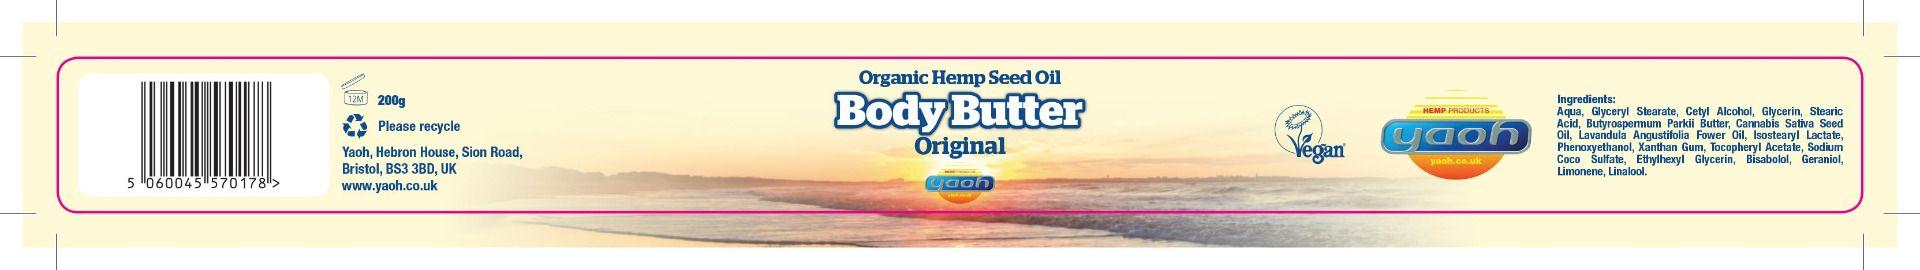 Yaoh Hemp Seed Oil Body Butter